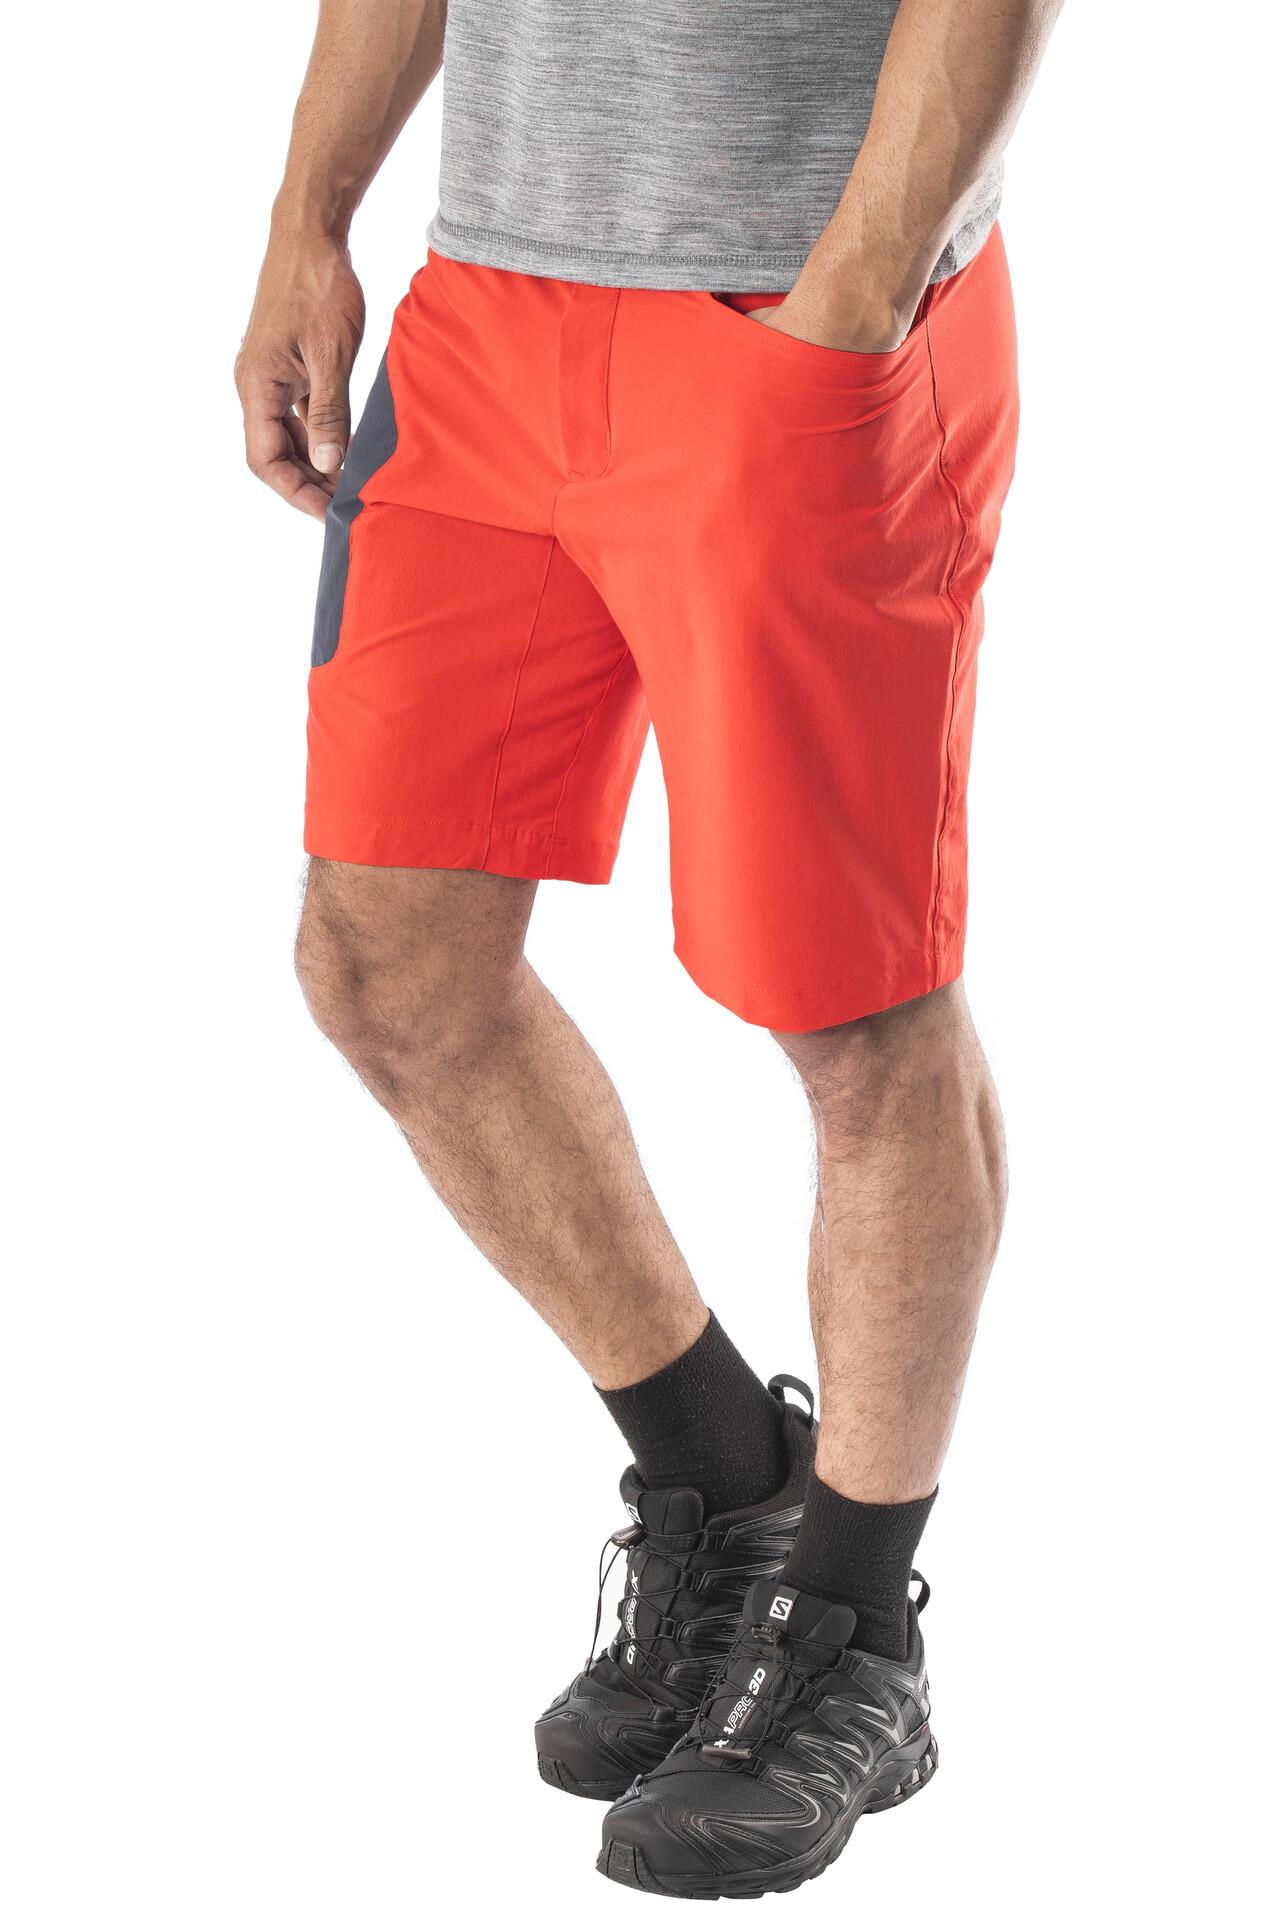 9794178d813e9 Millet trilogy cordura pantalones cortos hombre rojo azul jpg 3840x5760 Pantalones  cortos de hombre